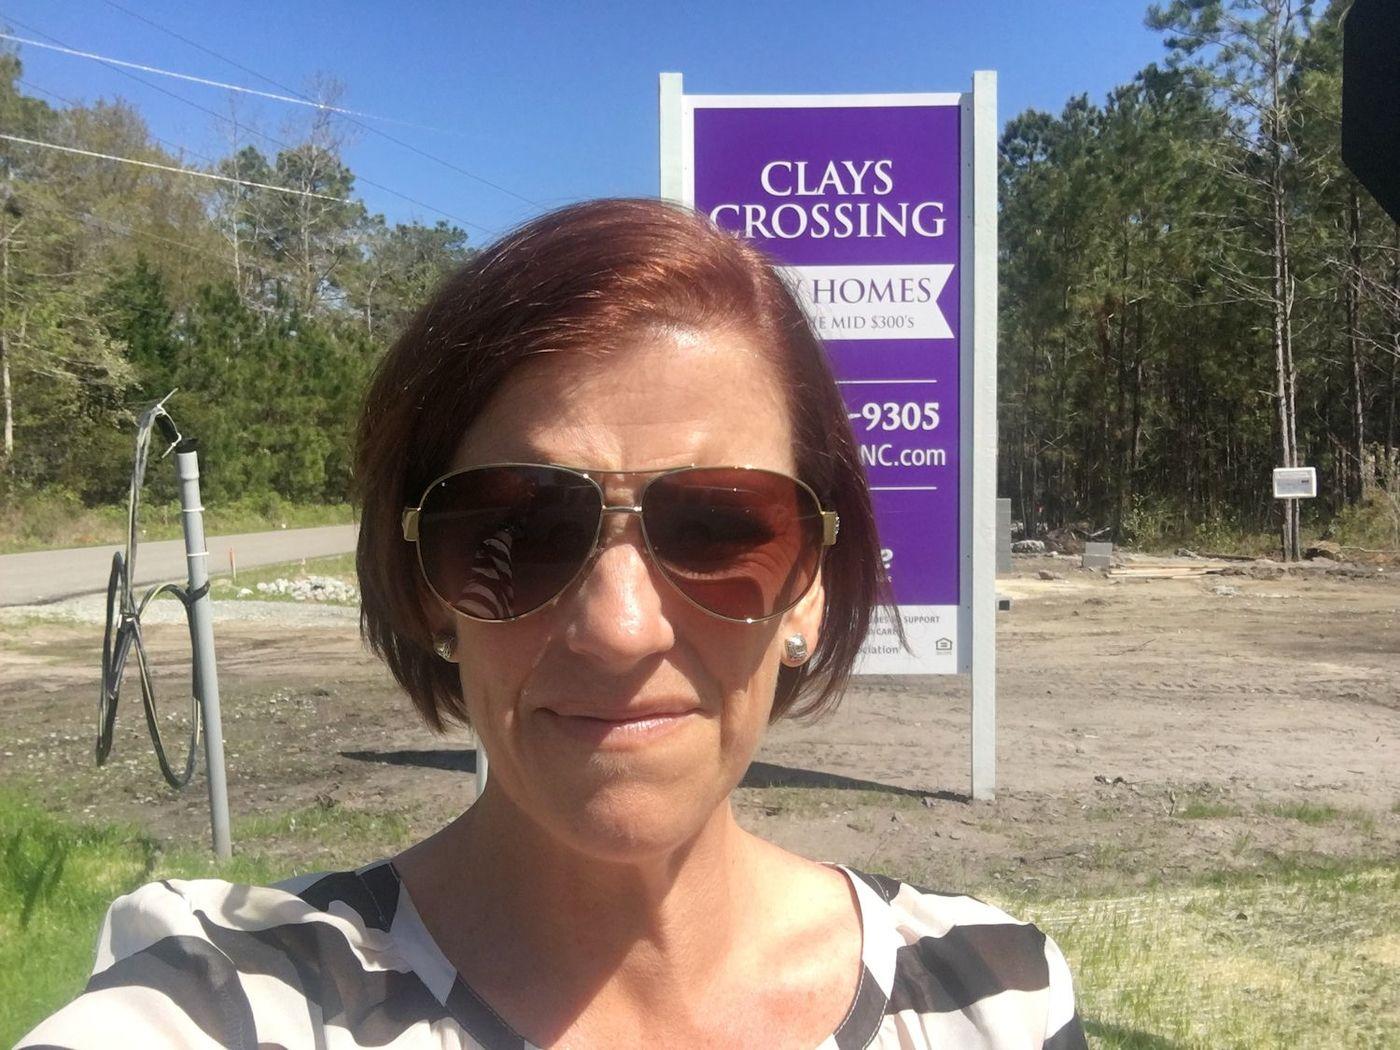 Melanie Cameron at Clays Crossing